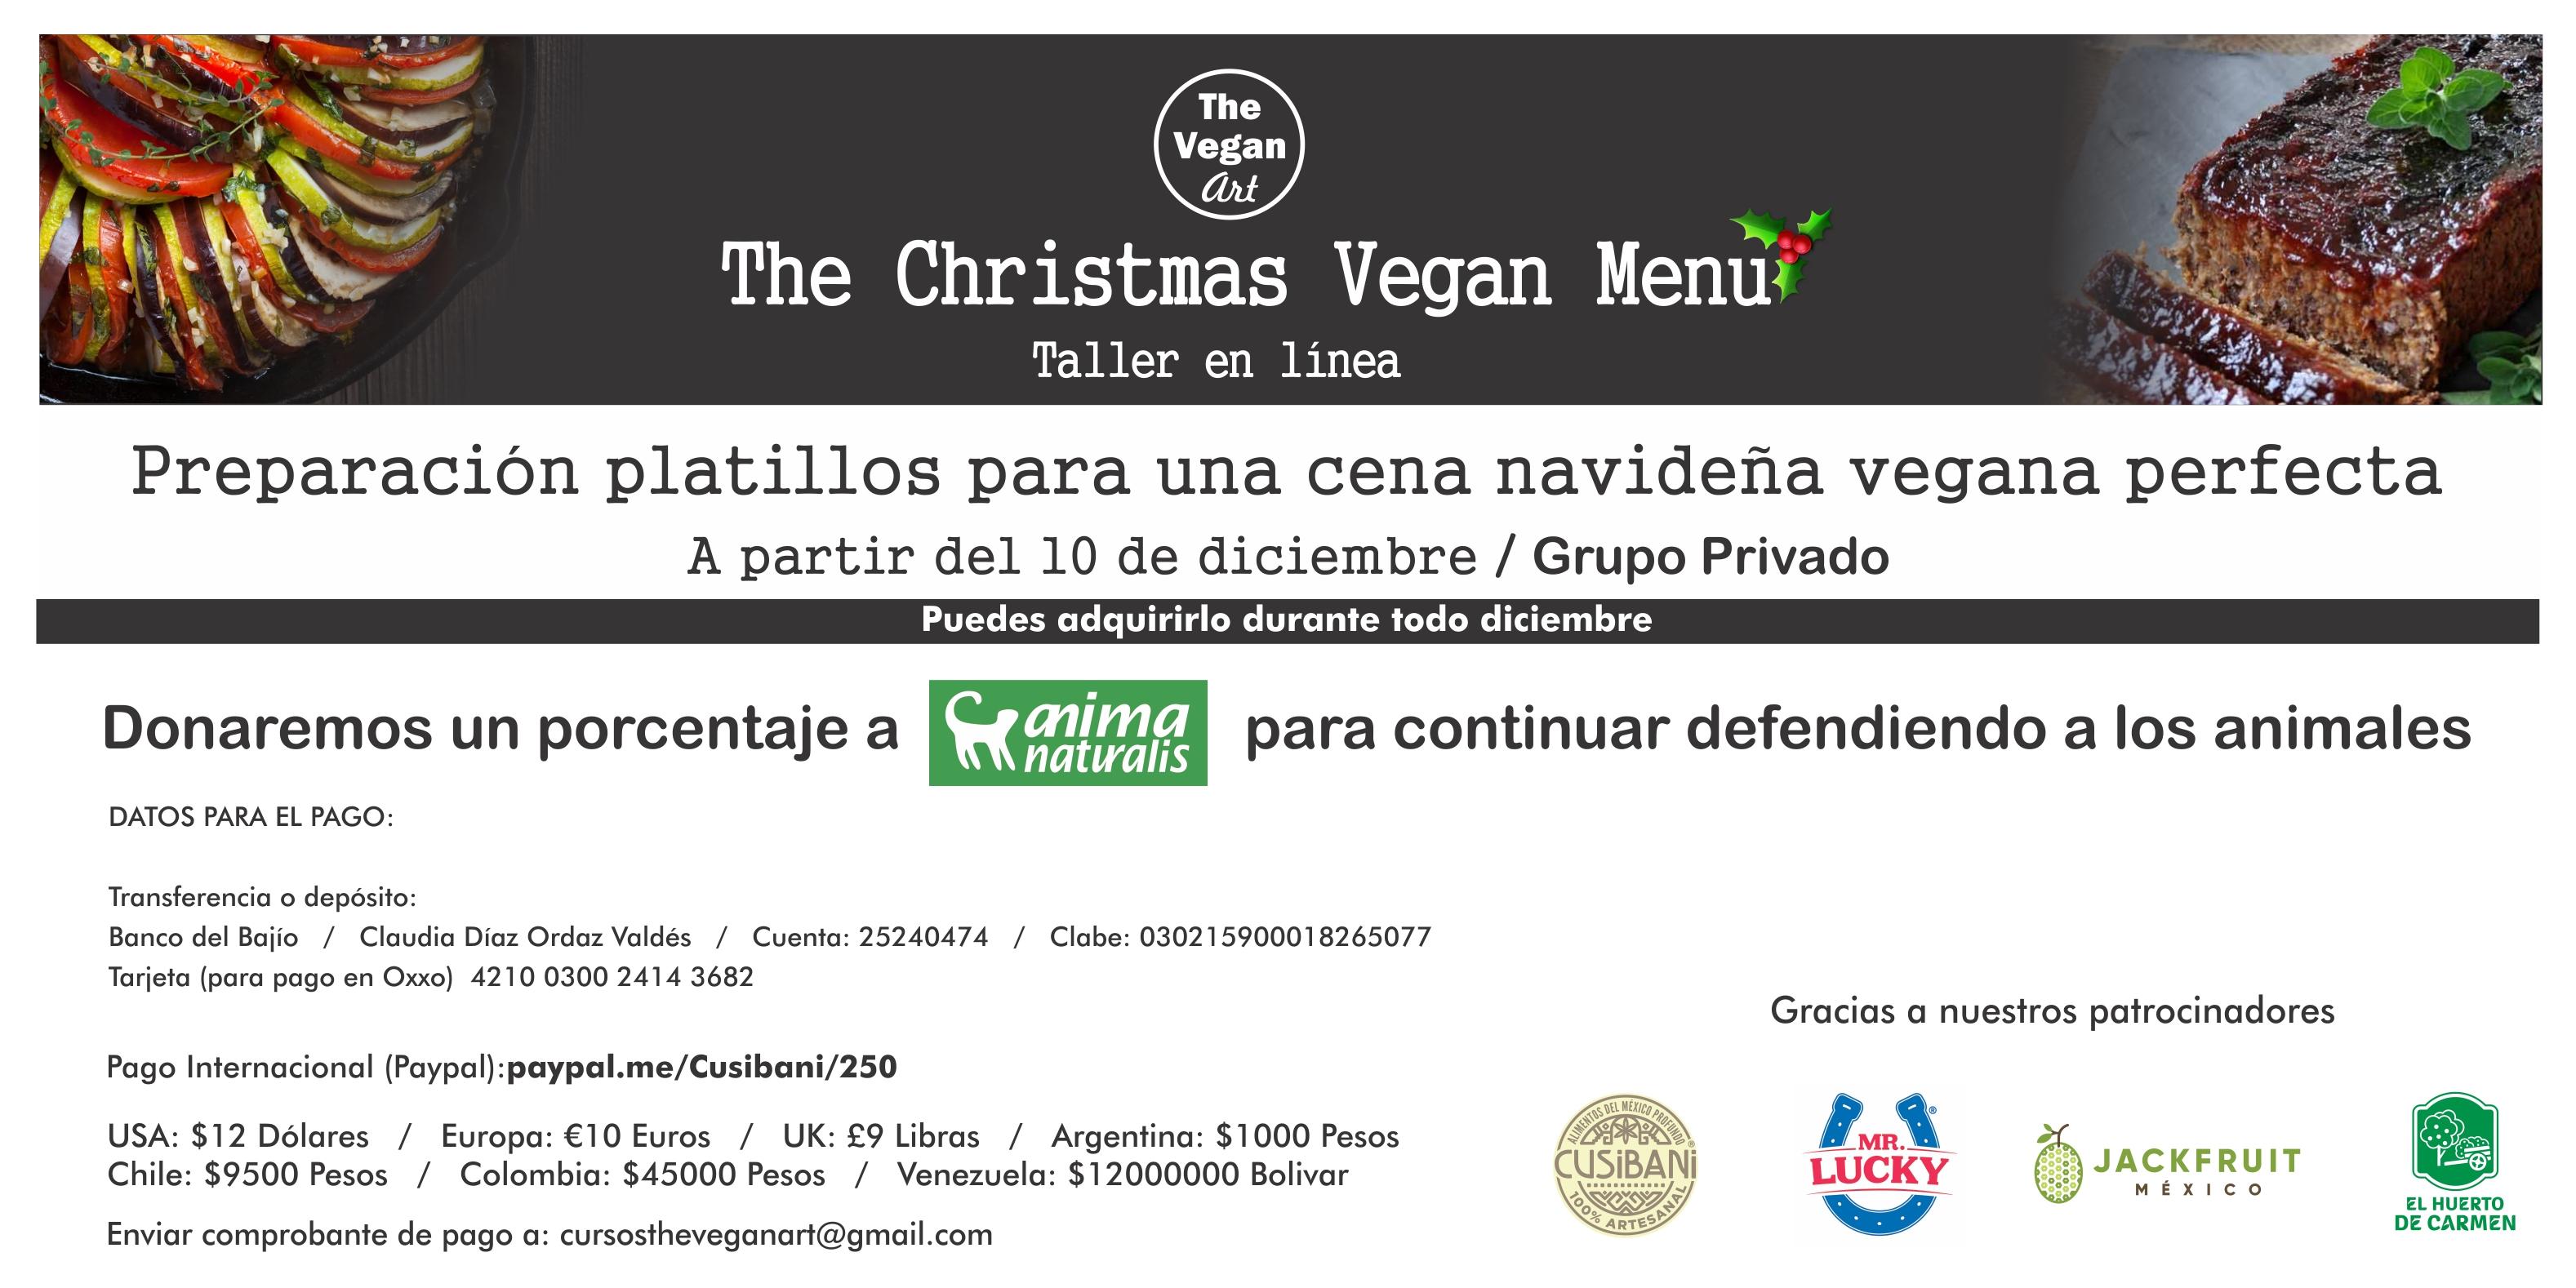 ¡Inscríbete al taller de The Vegan Art y haz tu cena navideña vegana!